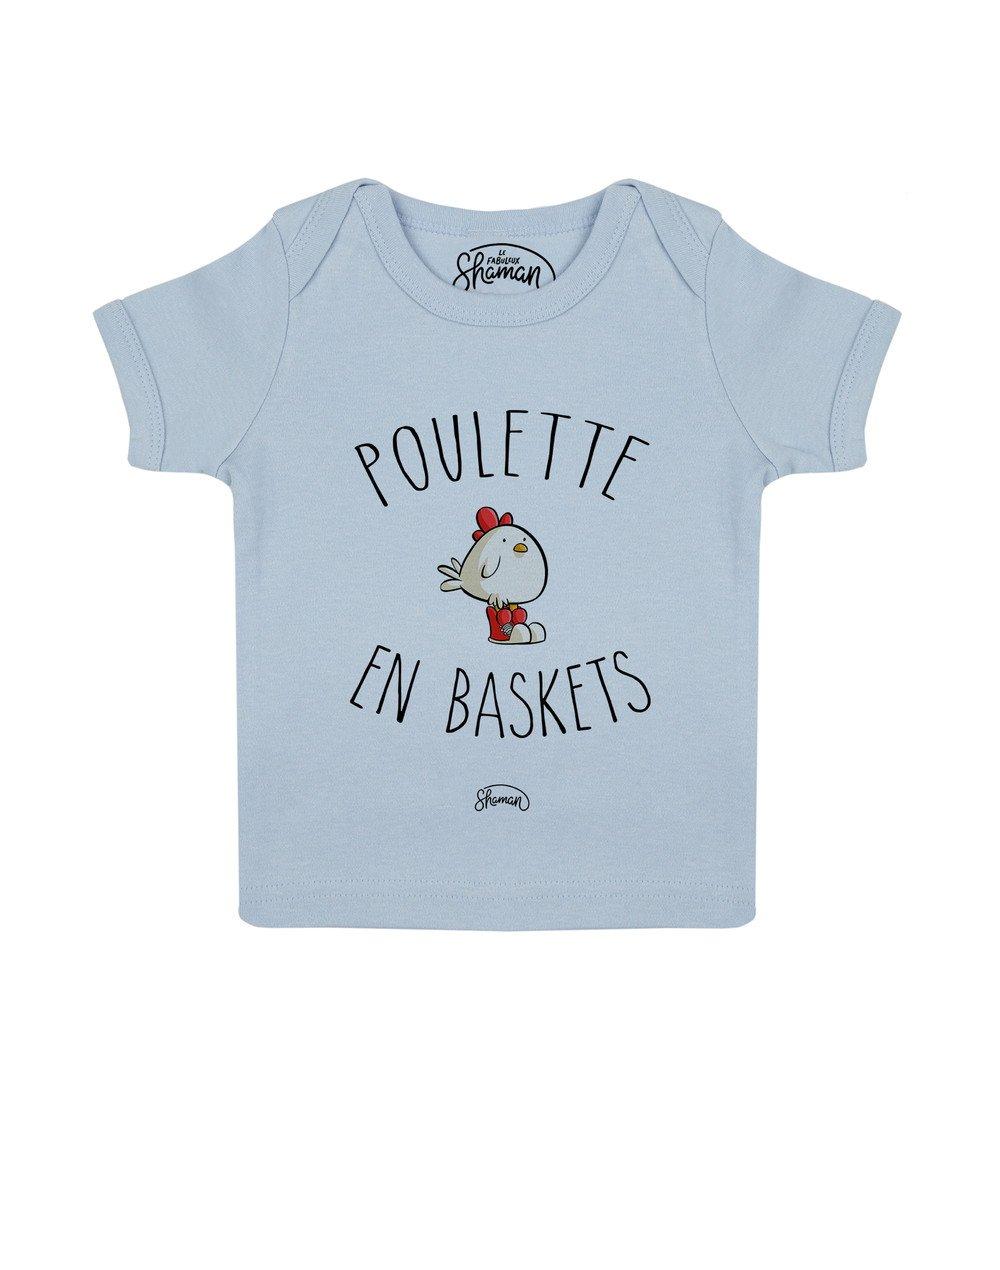 Tee shirt Poulette en baskets